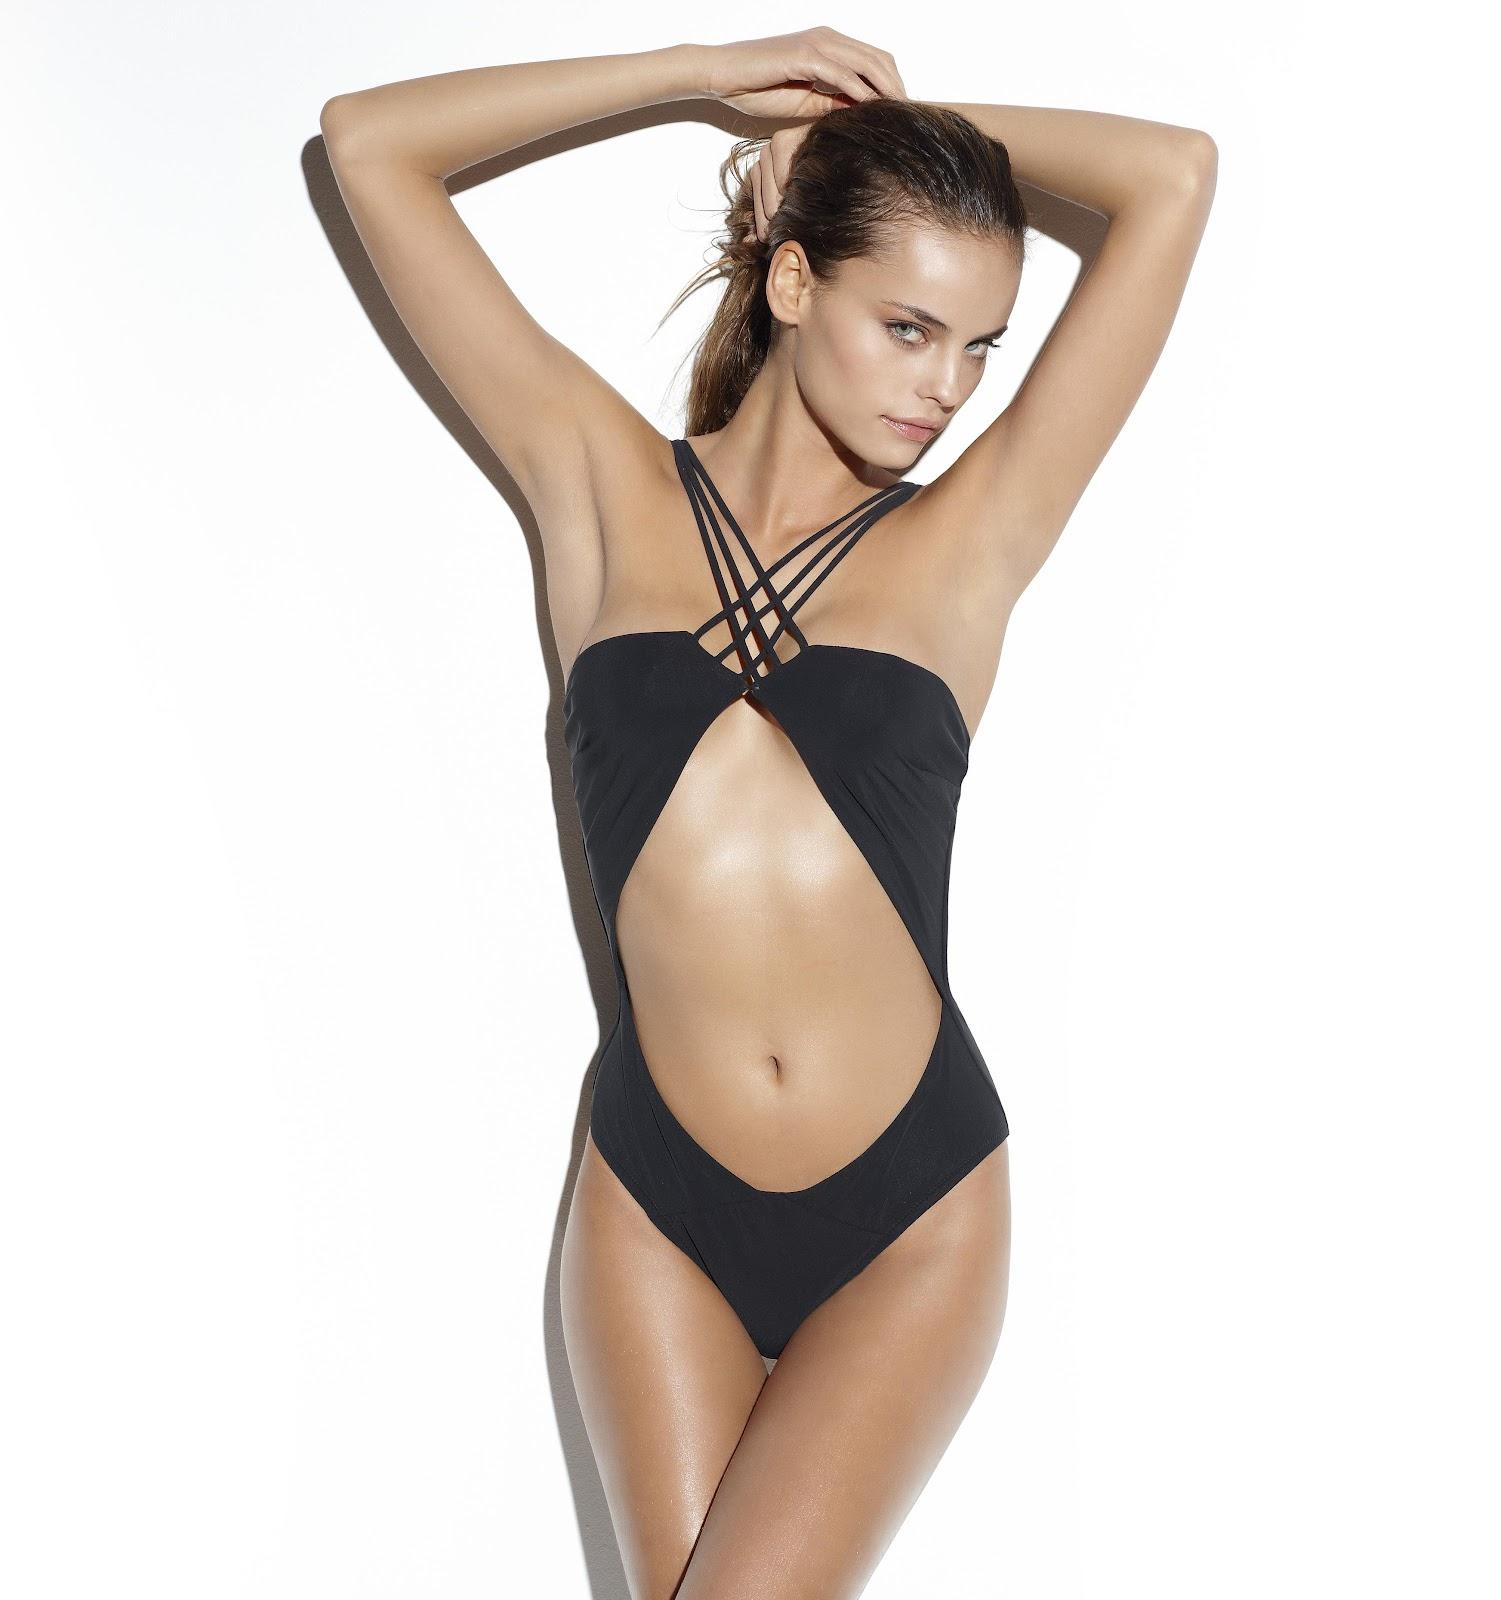 Daniela Freitas nude (52 foto) Bikini, Instagram, legs